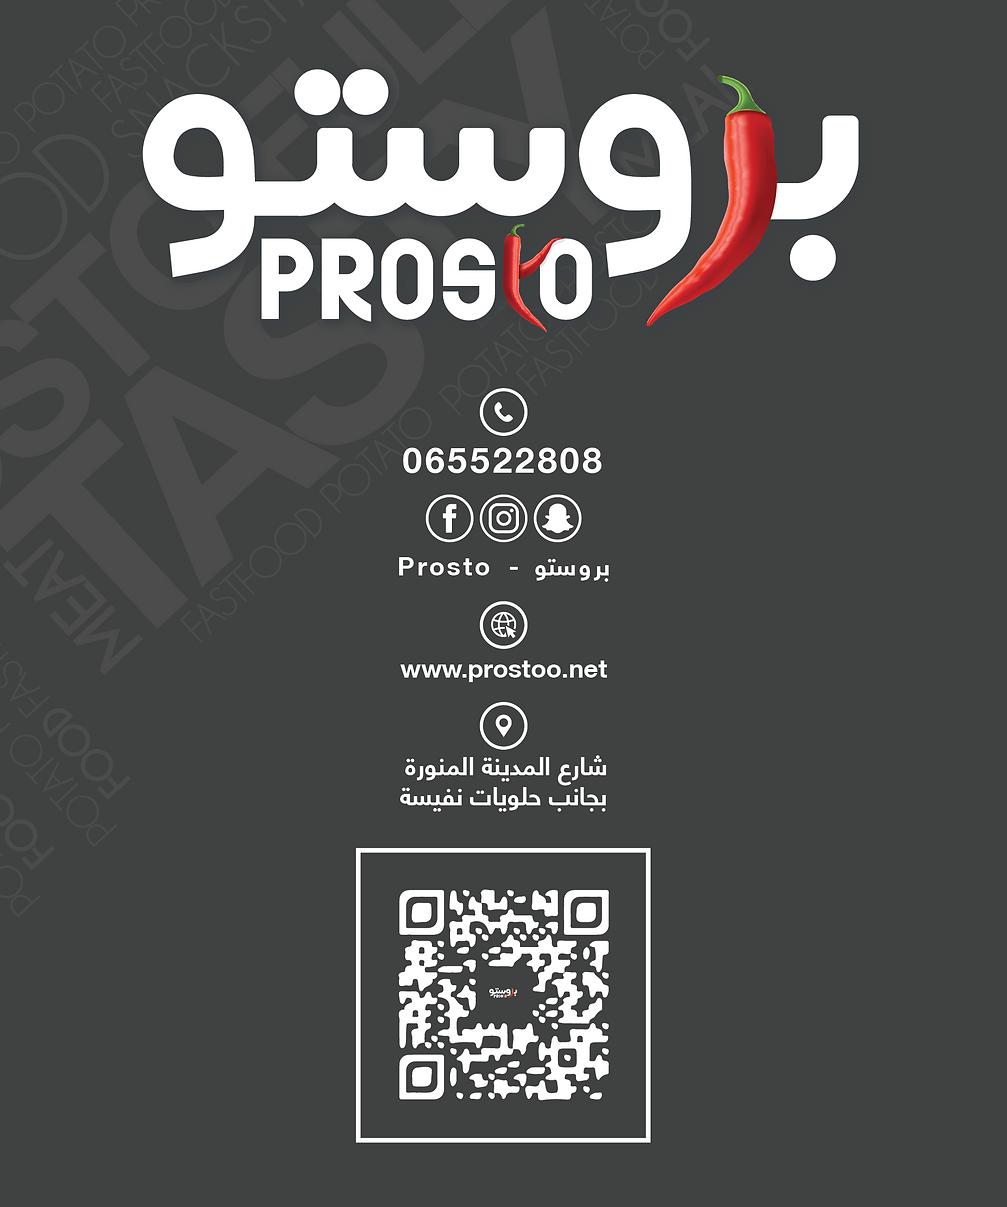 brosto menu - Copy-03.png